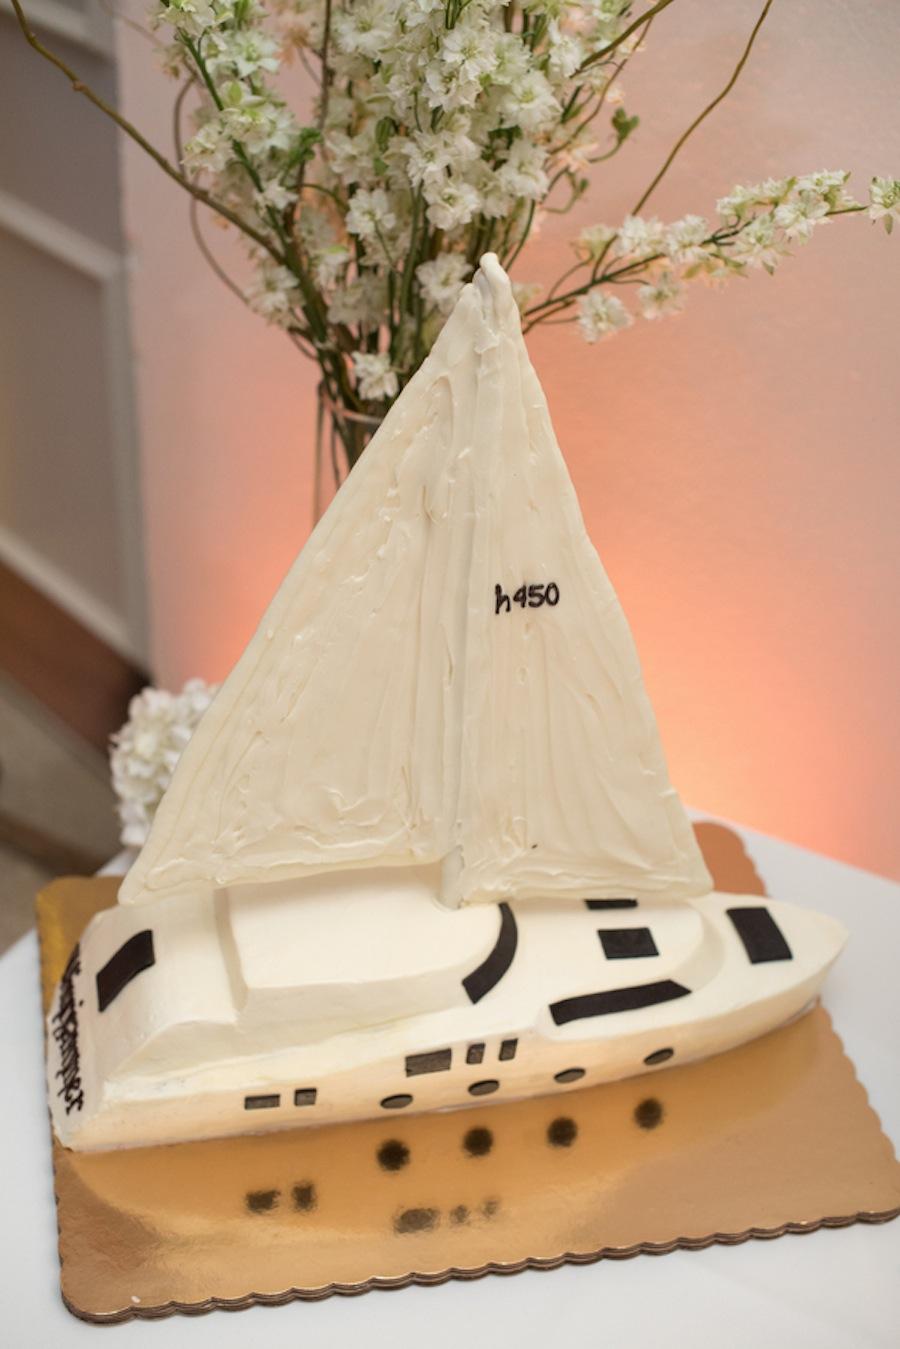 Sailboat Groom's Wedding Cake